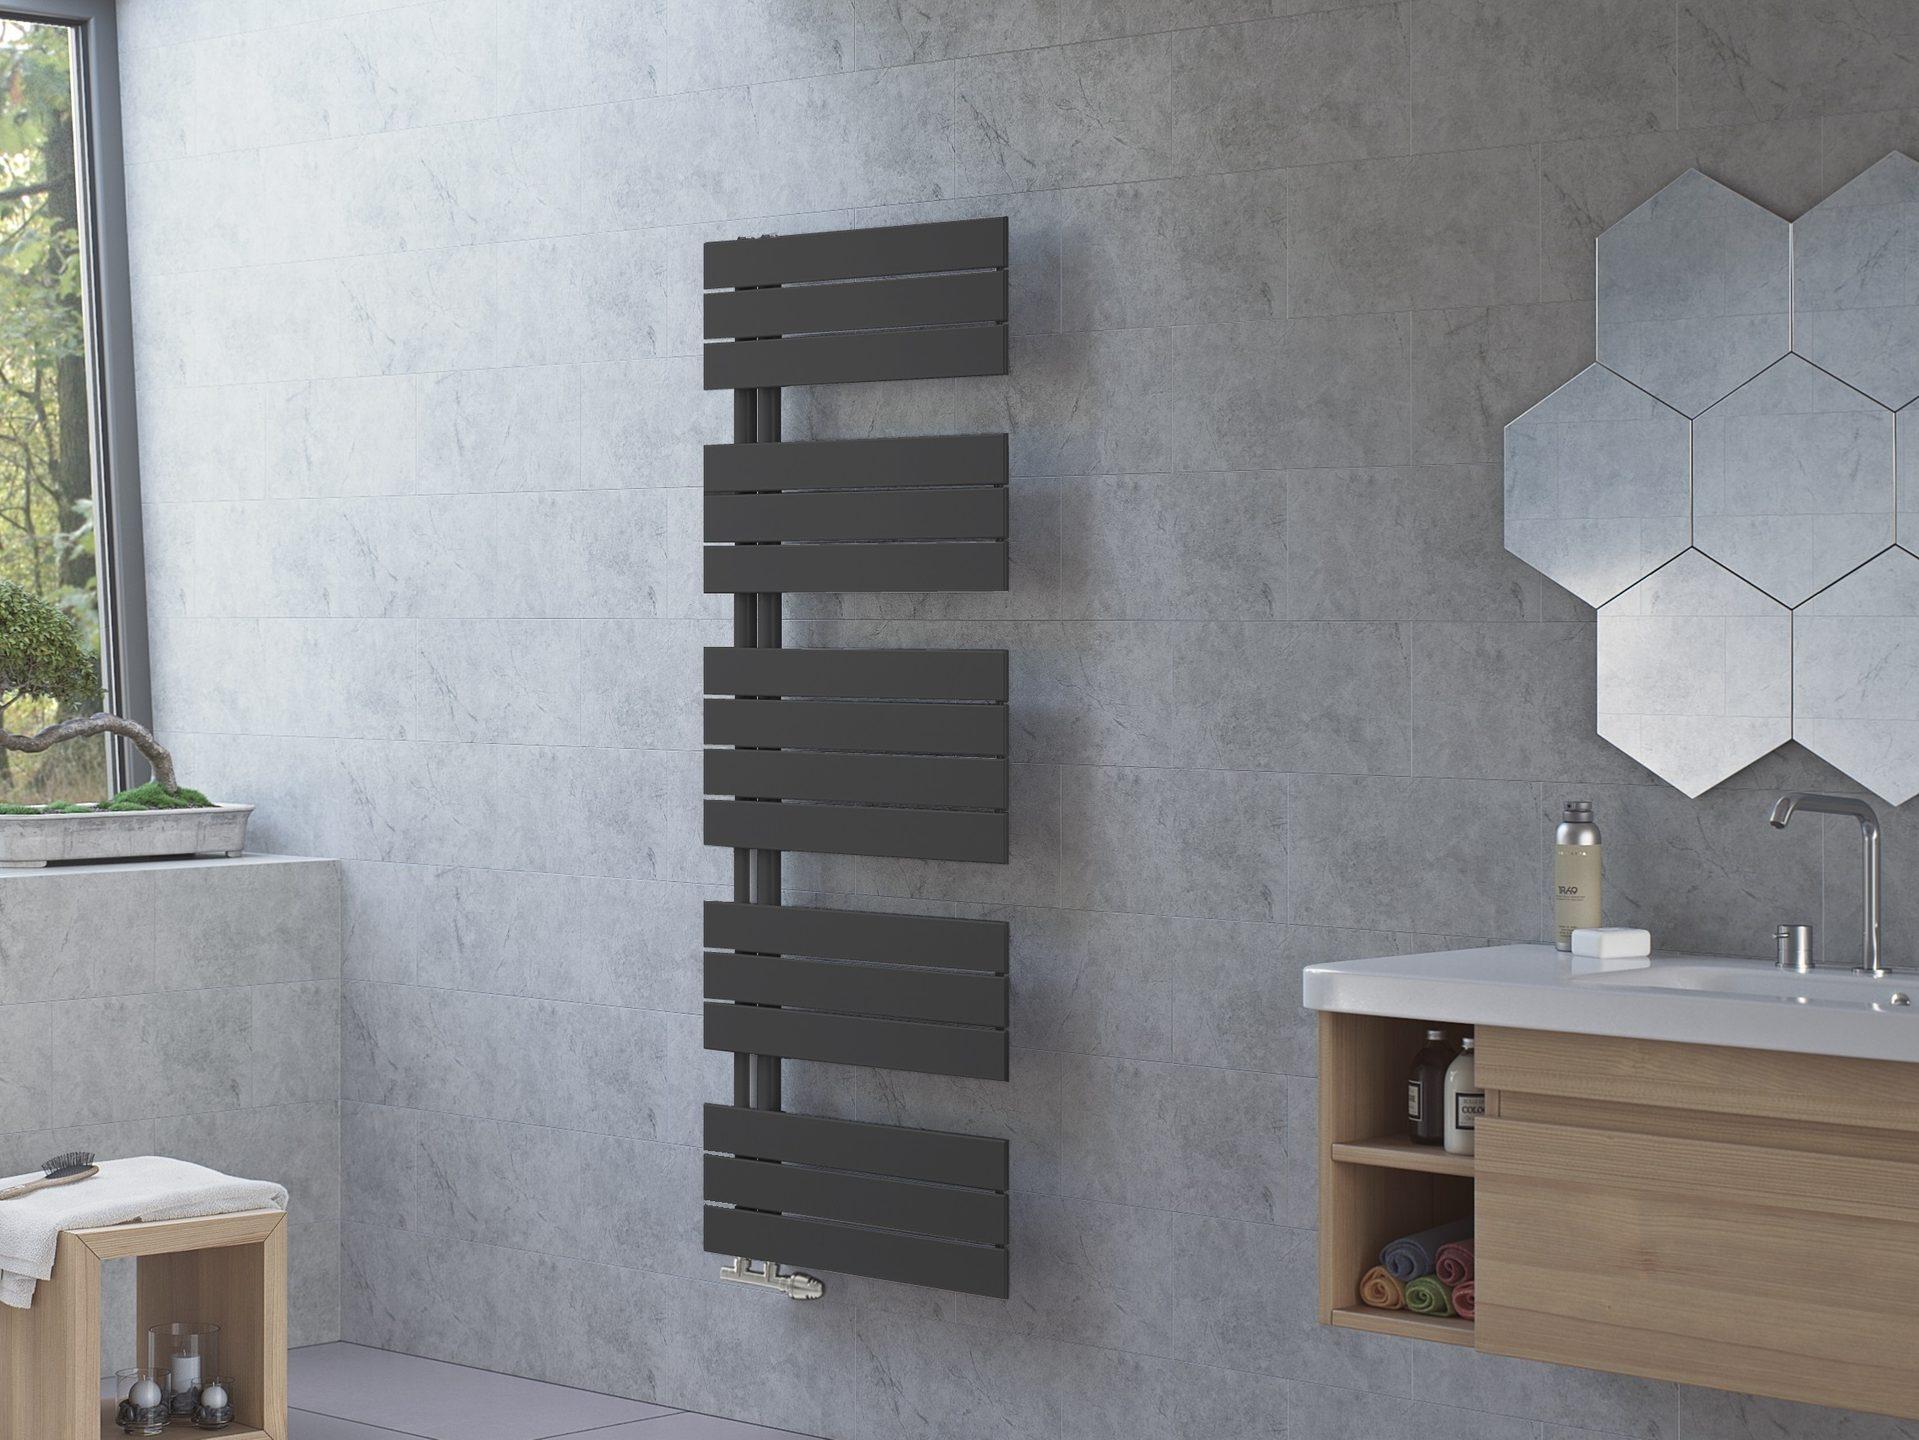 paneel badheizk rper 1200 x 600 mm seitlich offen rechts oder links. Black Bedroom Furniture Sets. Home Design Ideas